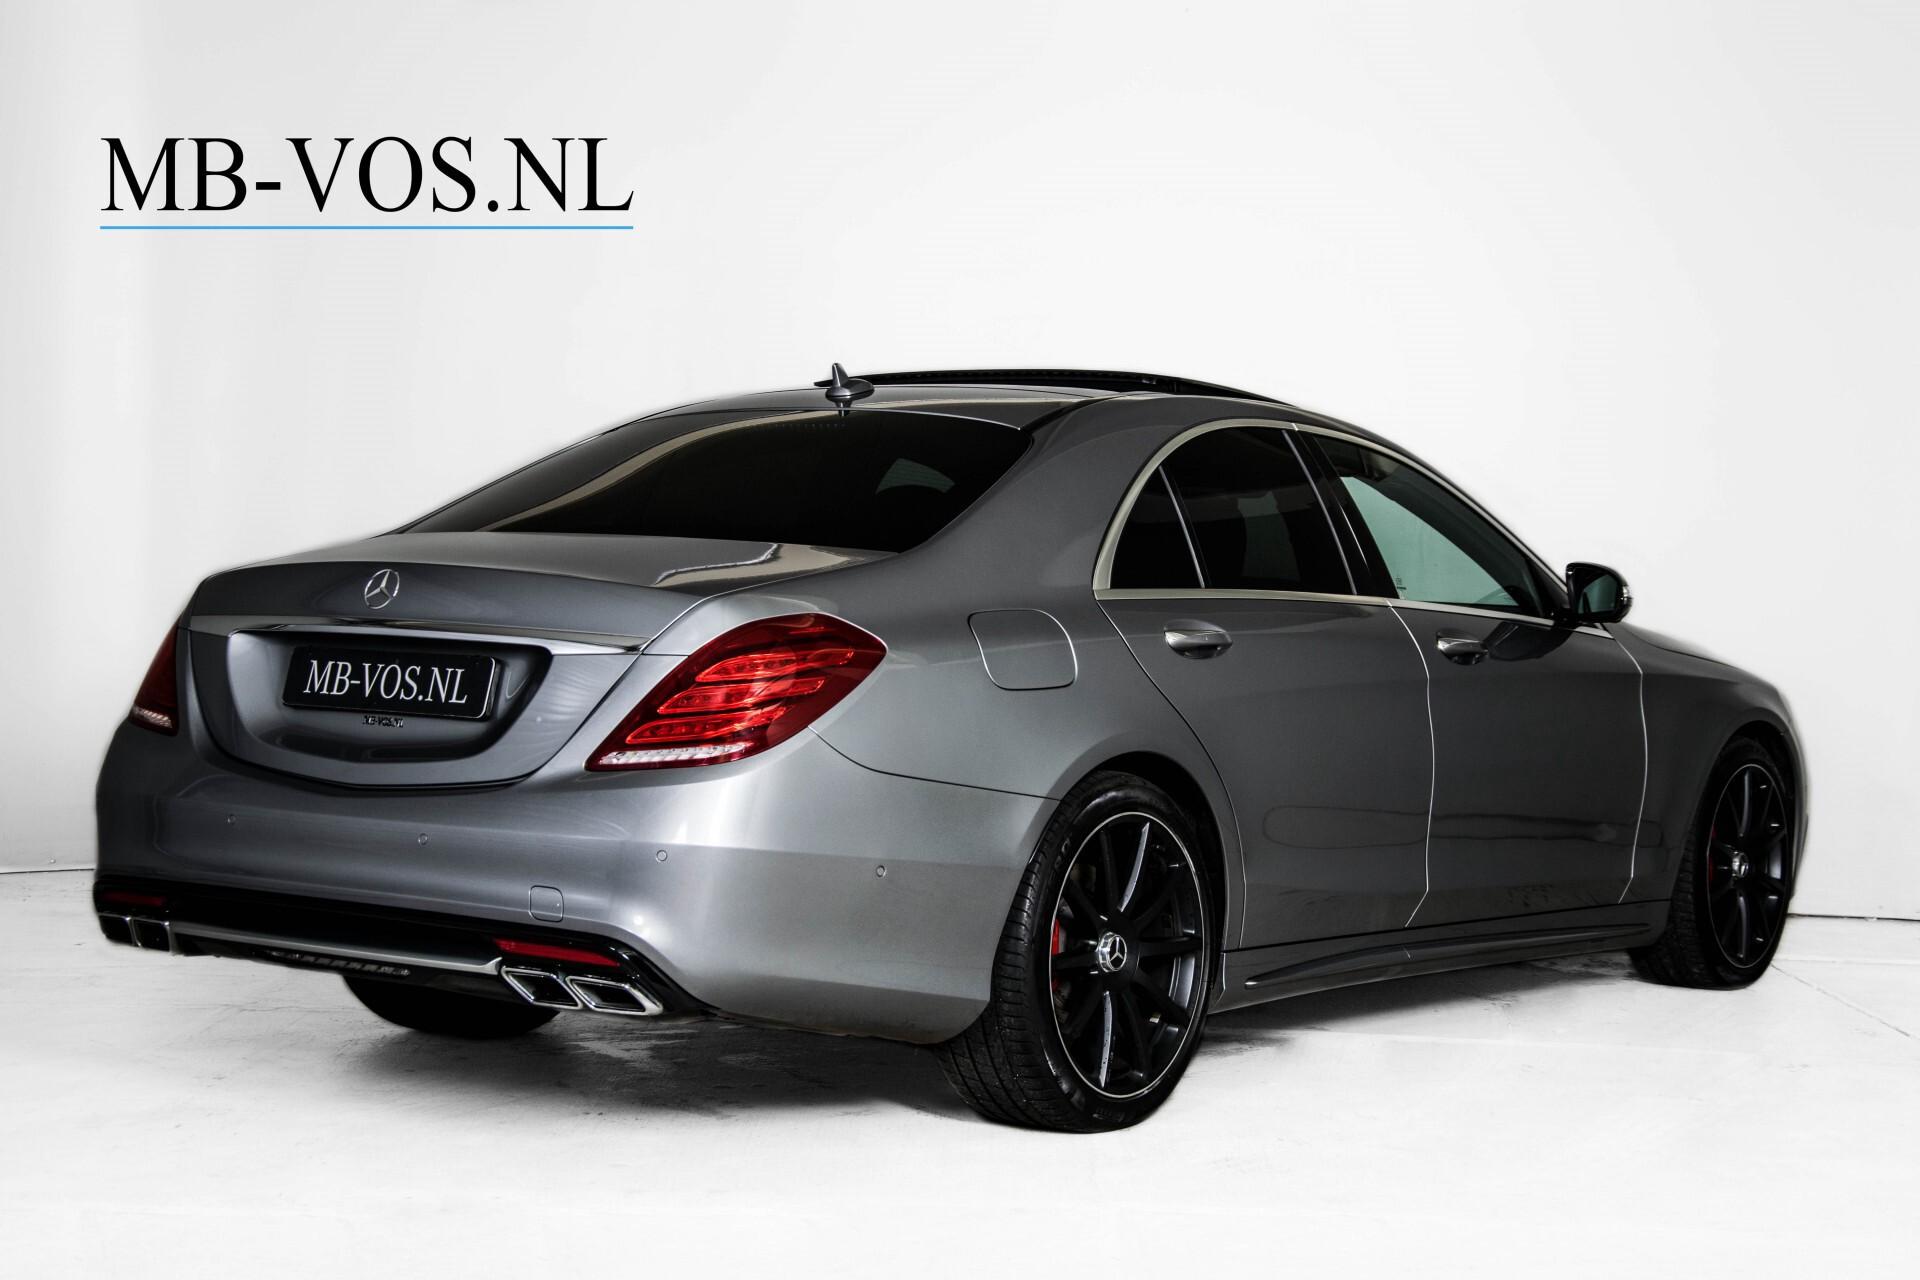 Mercedes-Benz S-Klasse 350 BlueTEC 63 AMG Panorama/Distronic/Keyless/Massage/Burmester Aut7 Foto 2